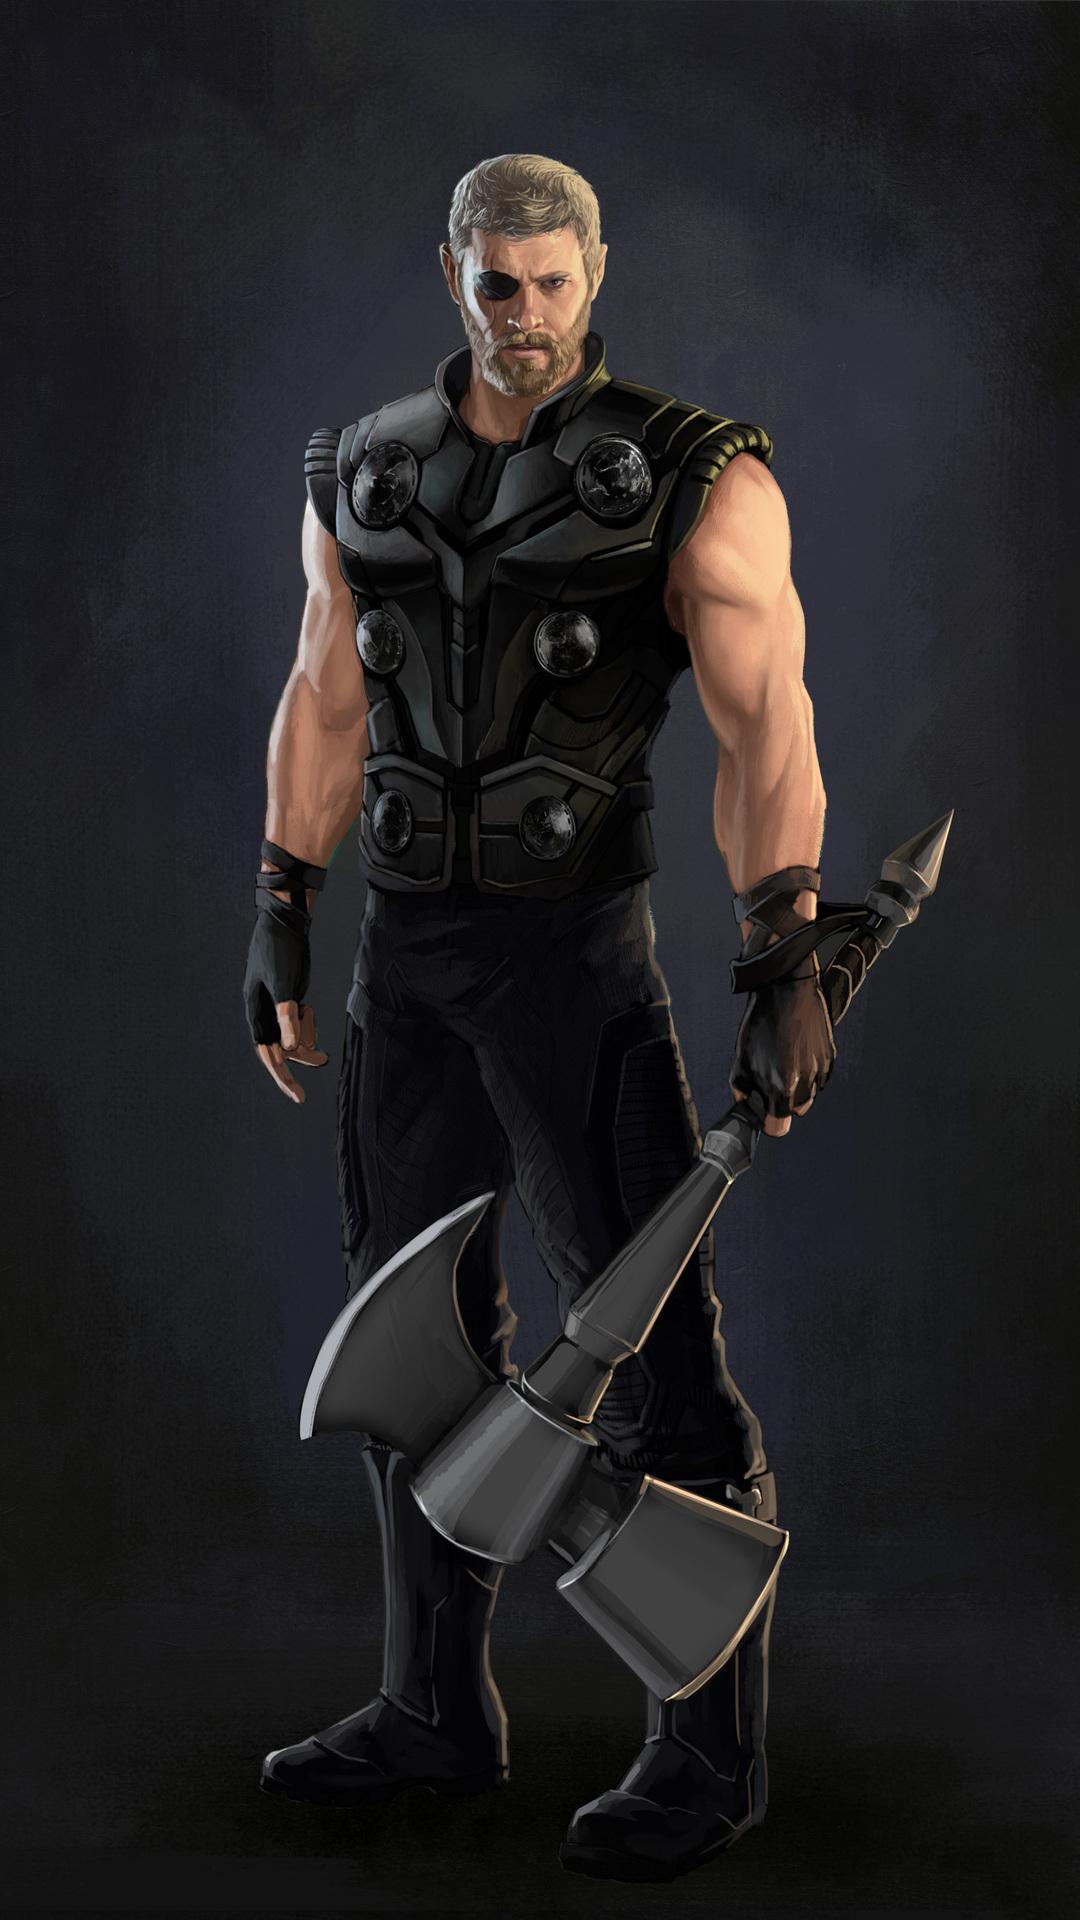 Thor Avengers Infinity War Artwork 15